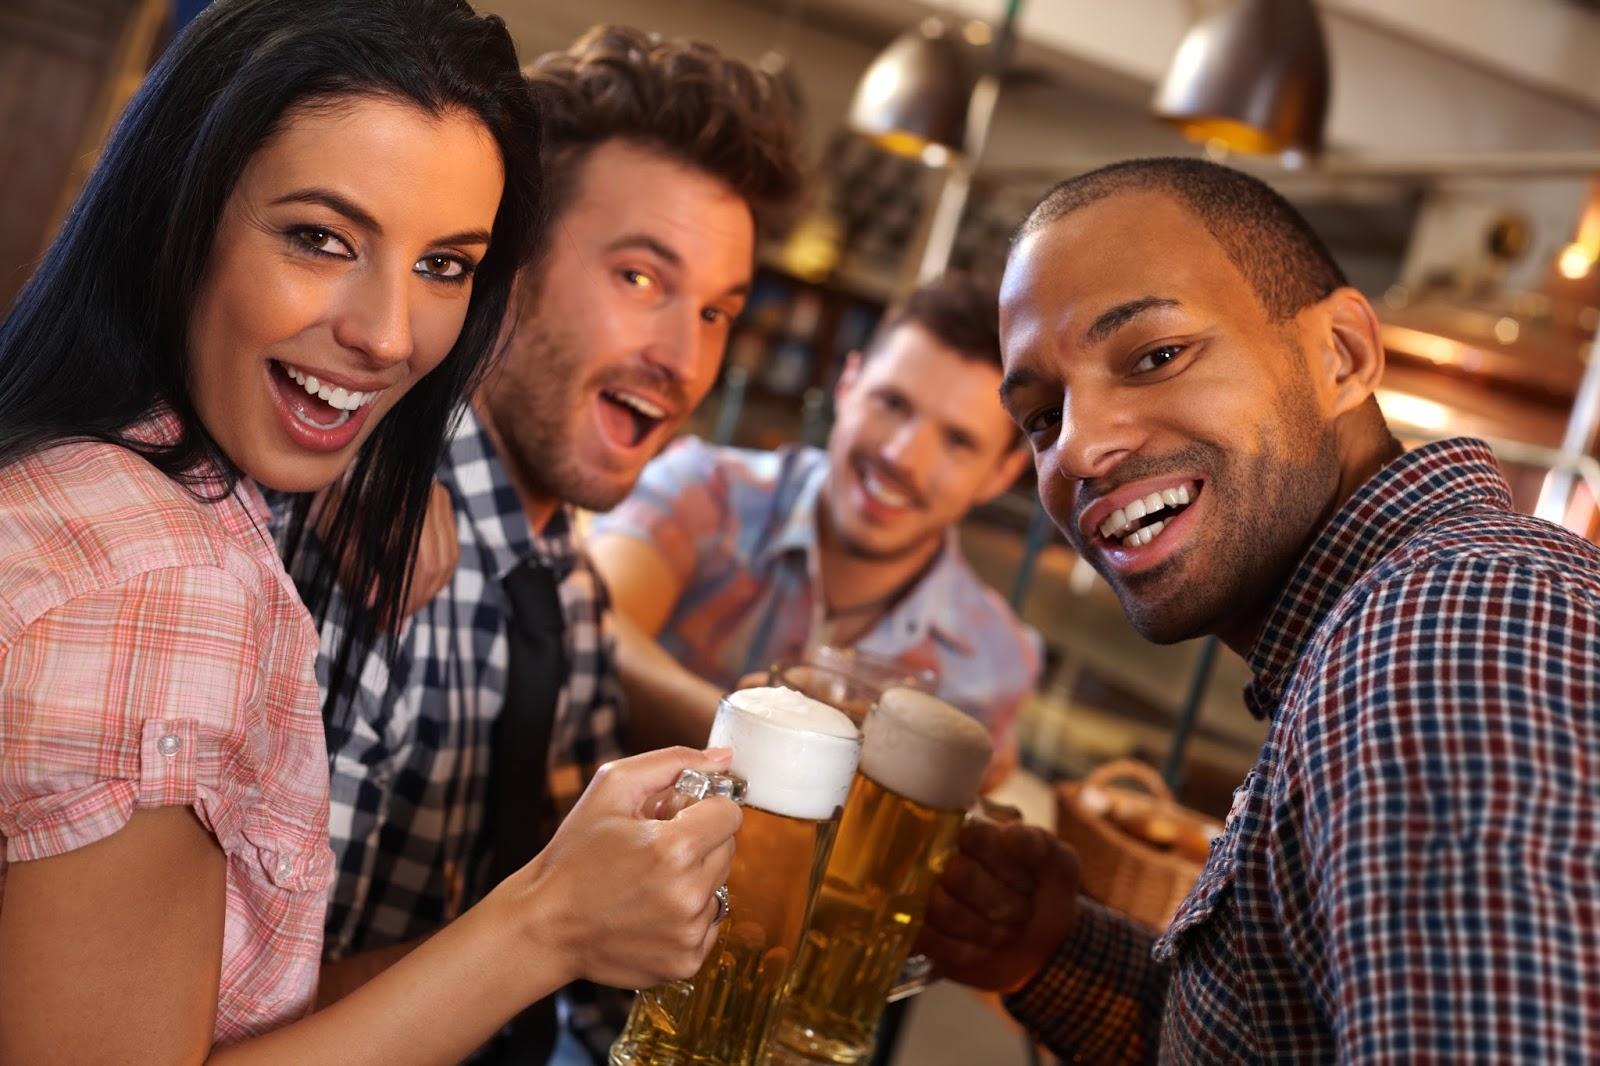 парням нравятся девушки любят пиво